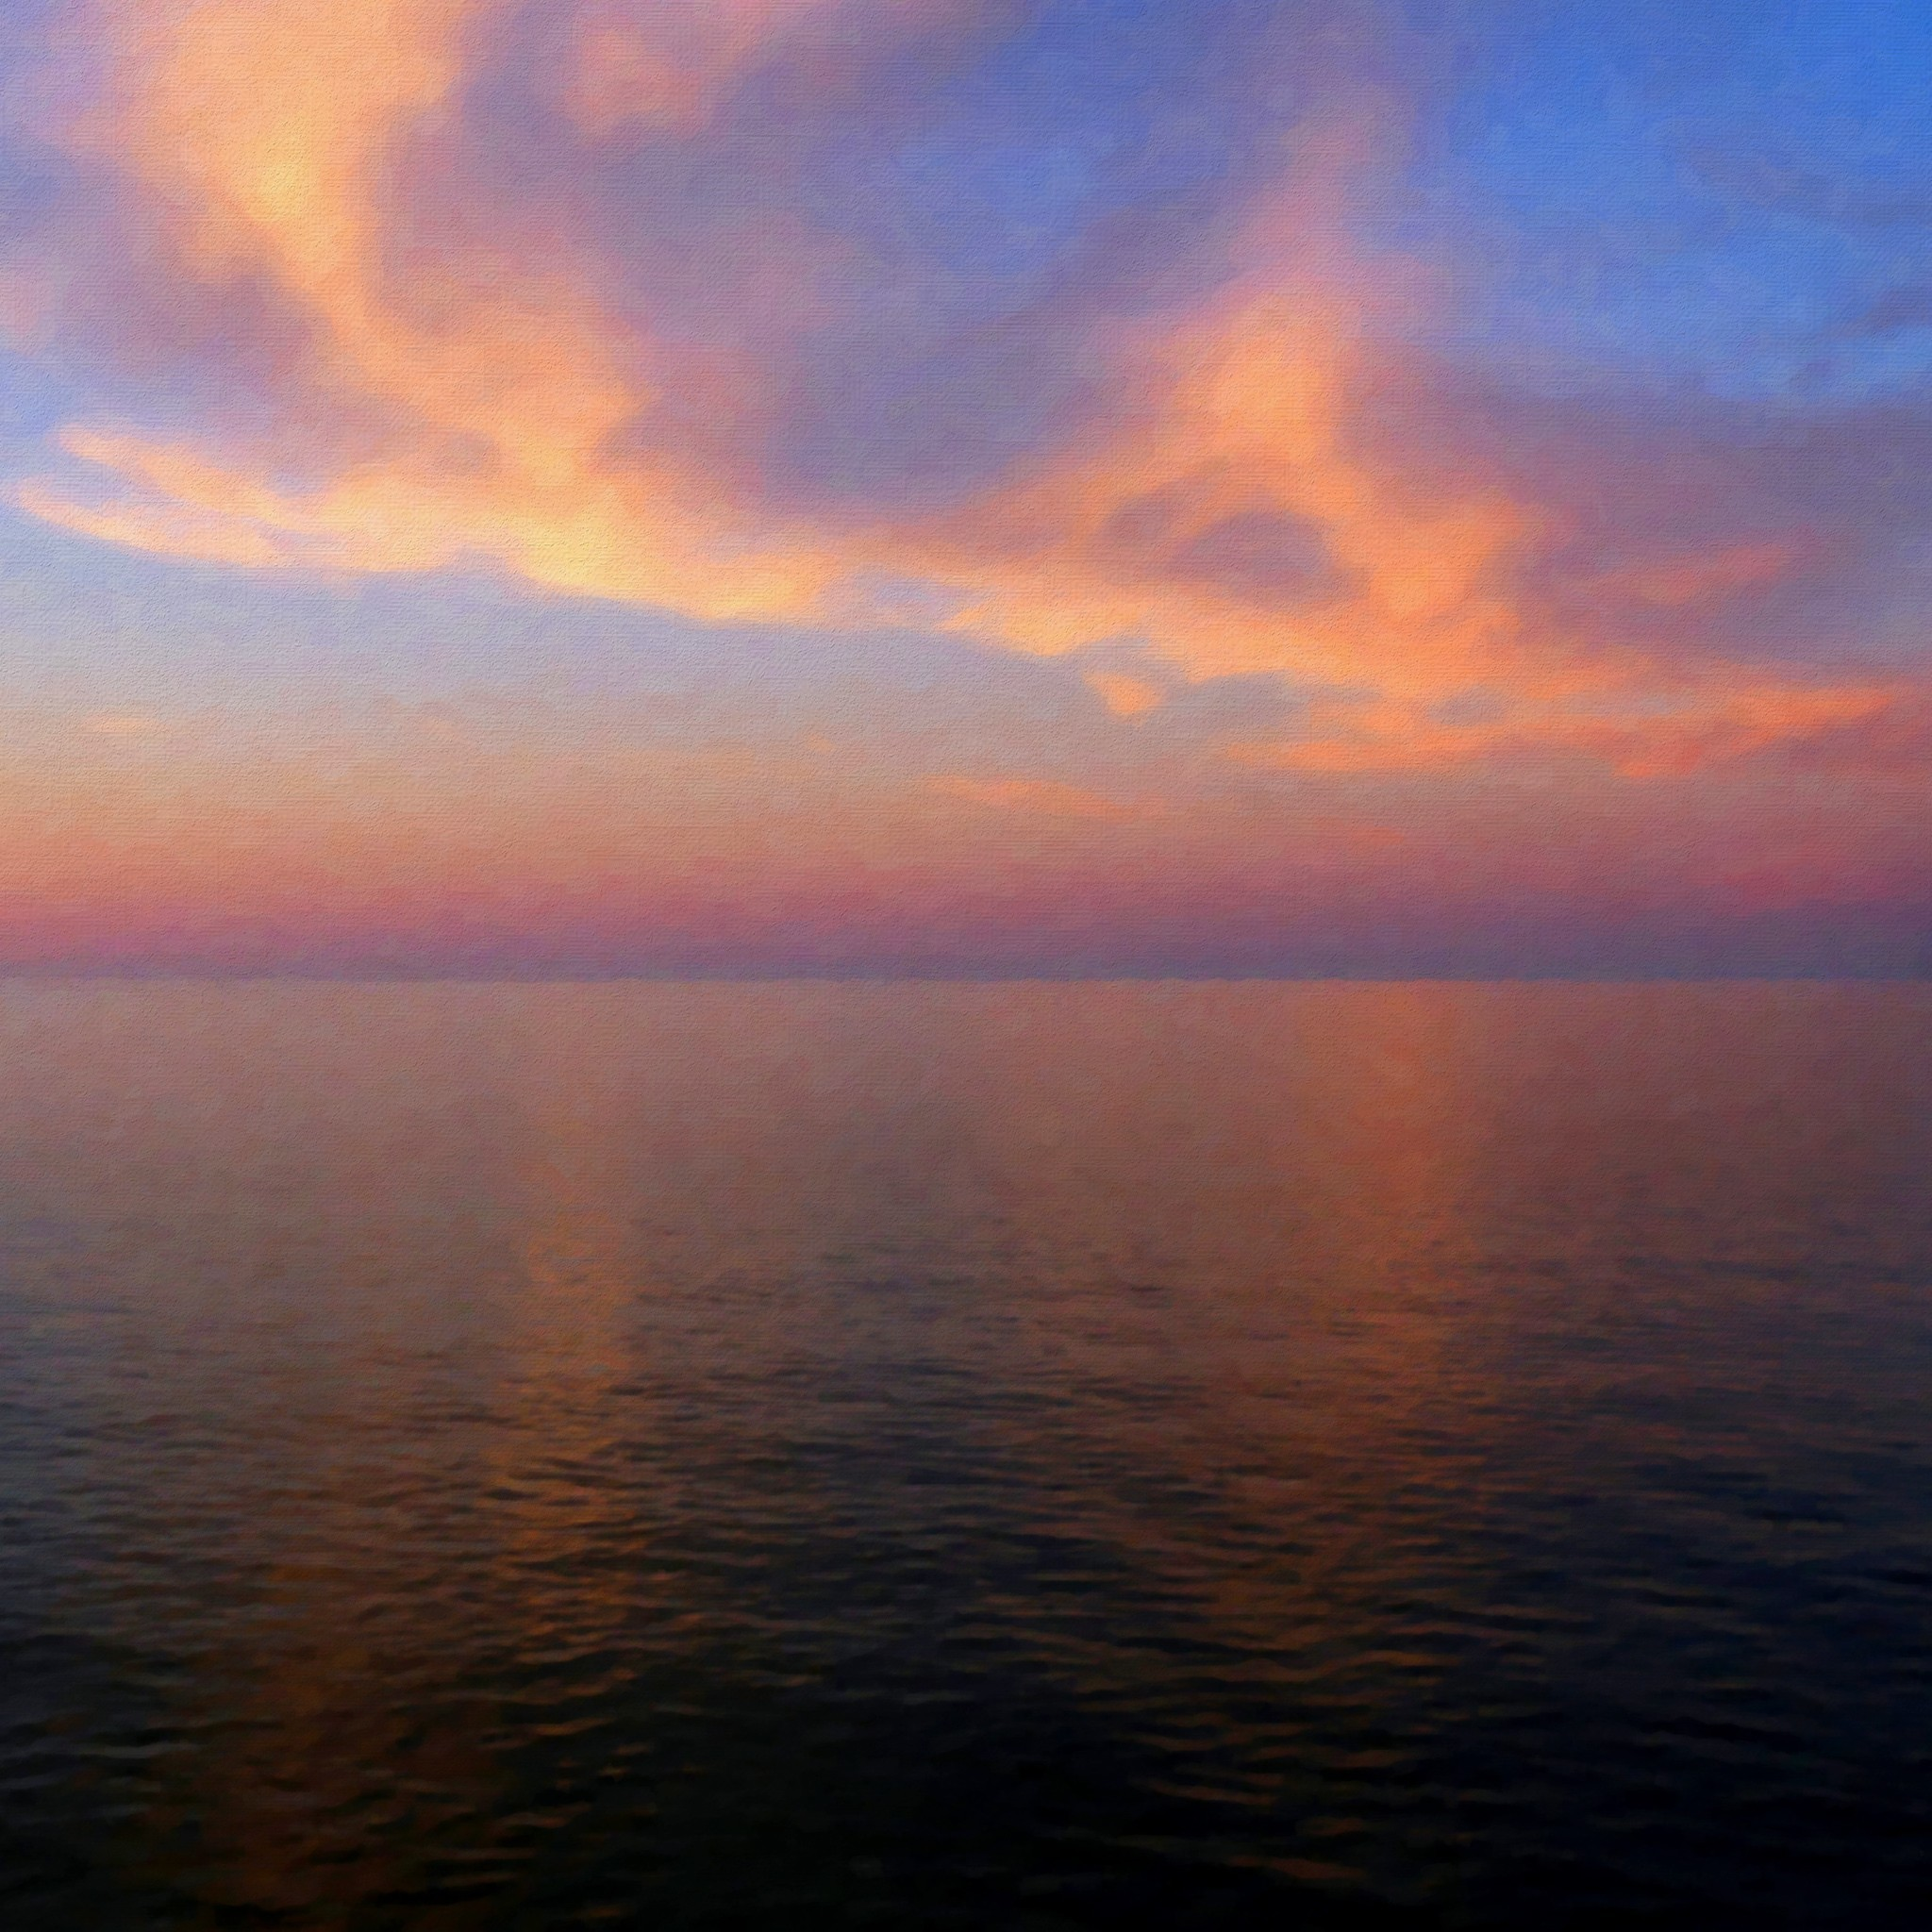 Res: 2048x2048, Calm-Sunset-Skyview-Ocean-Pure-ipad-air-wallpaper-ilikewallpaper_com